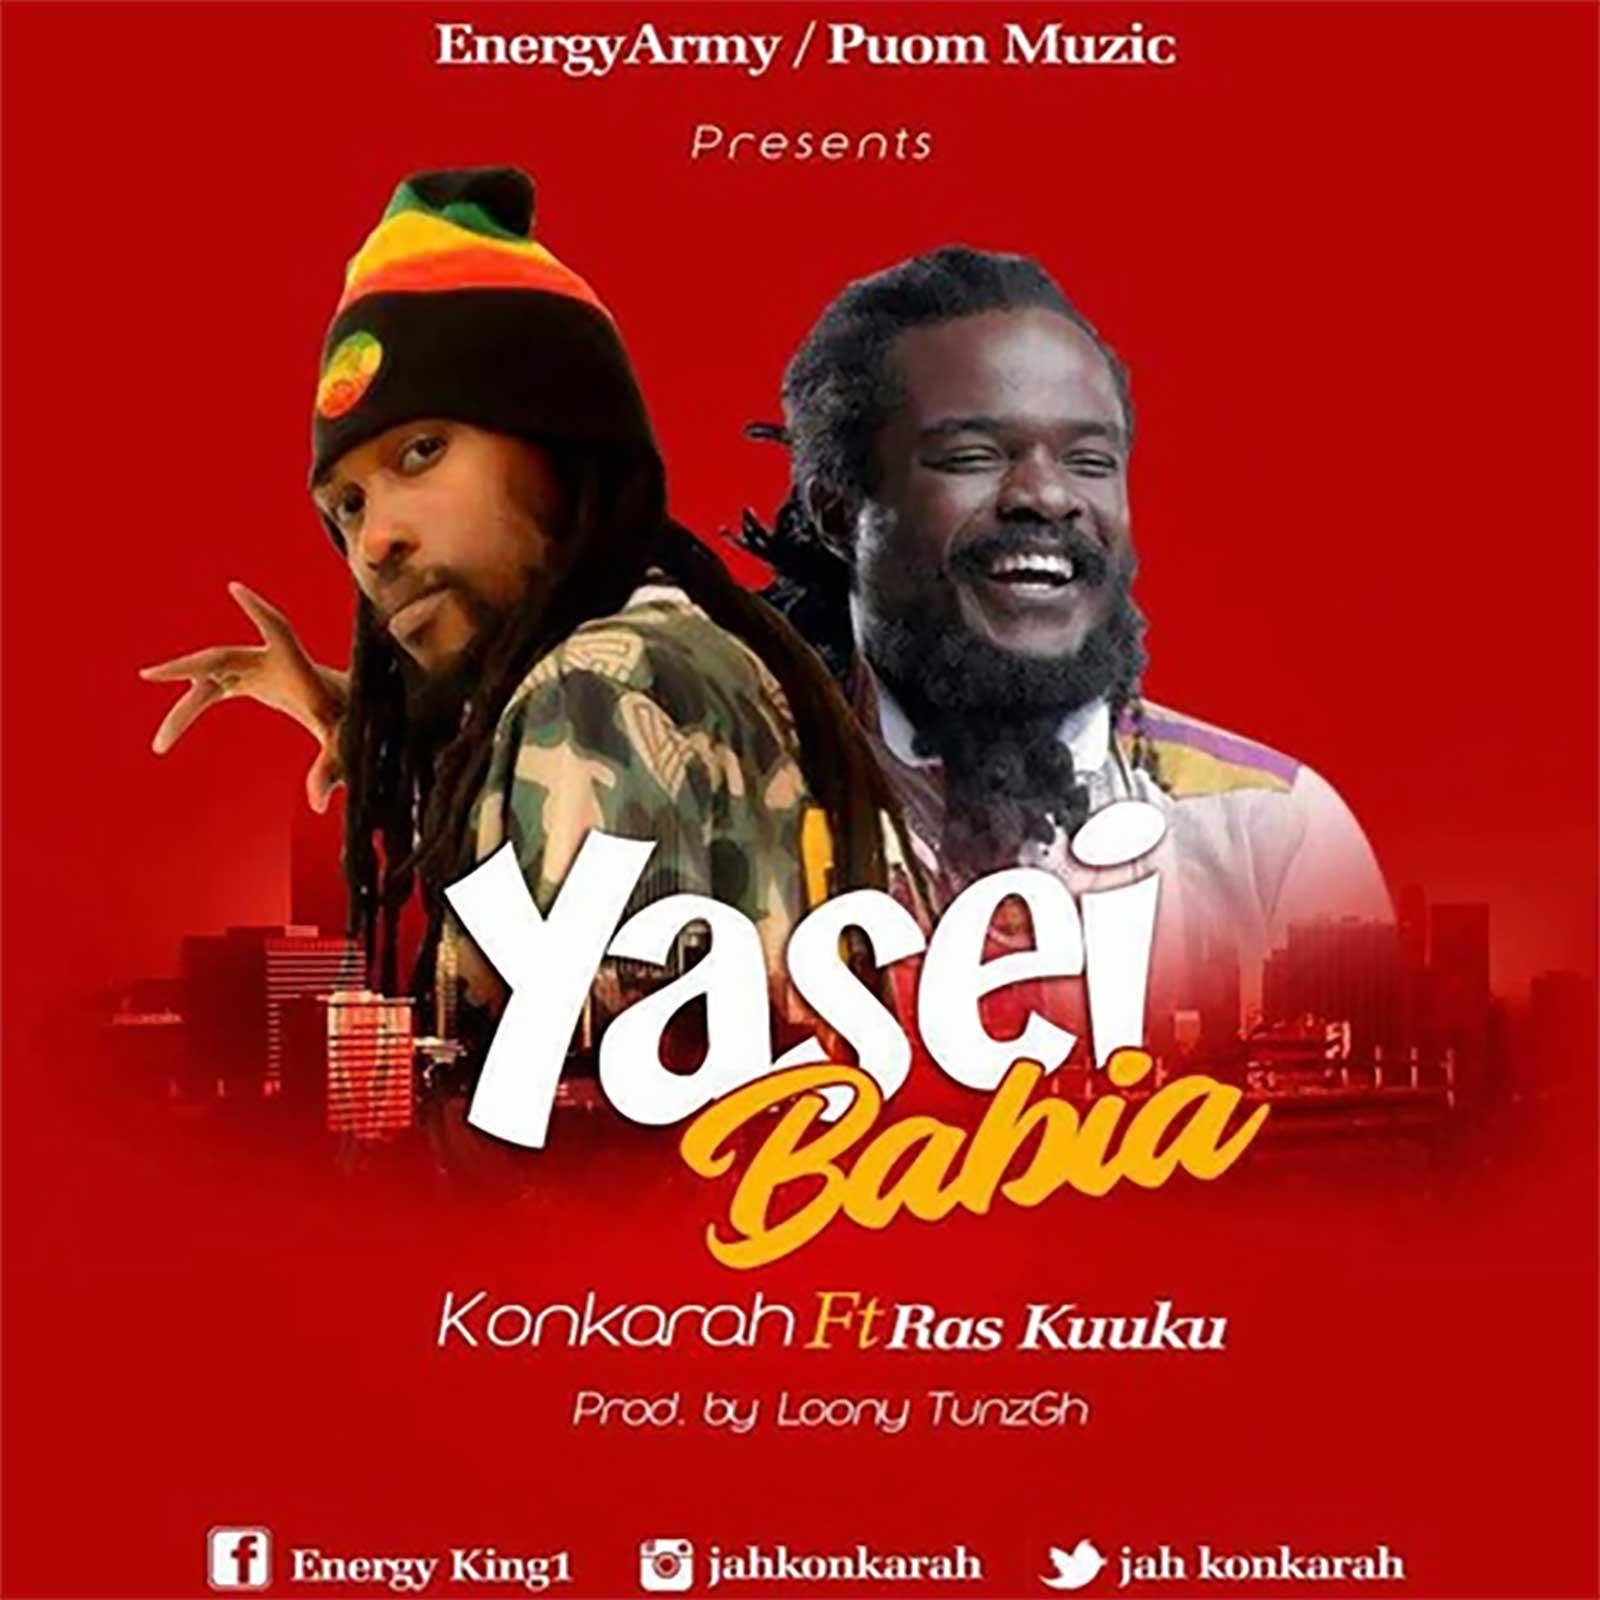 Yasei Babia by Konkarah feat. Ras Kuuku